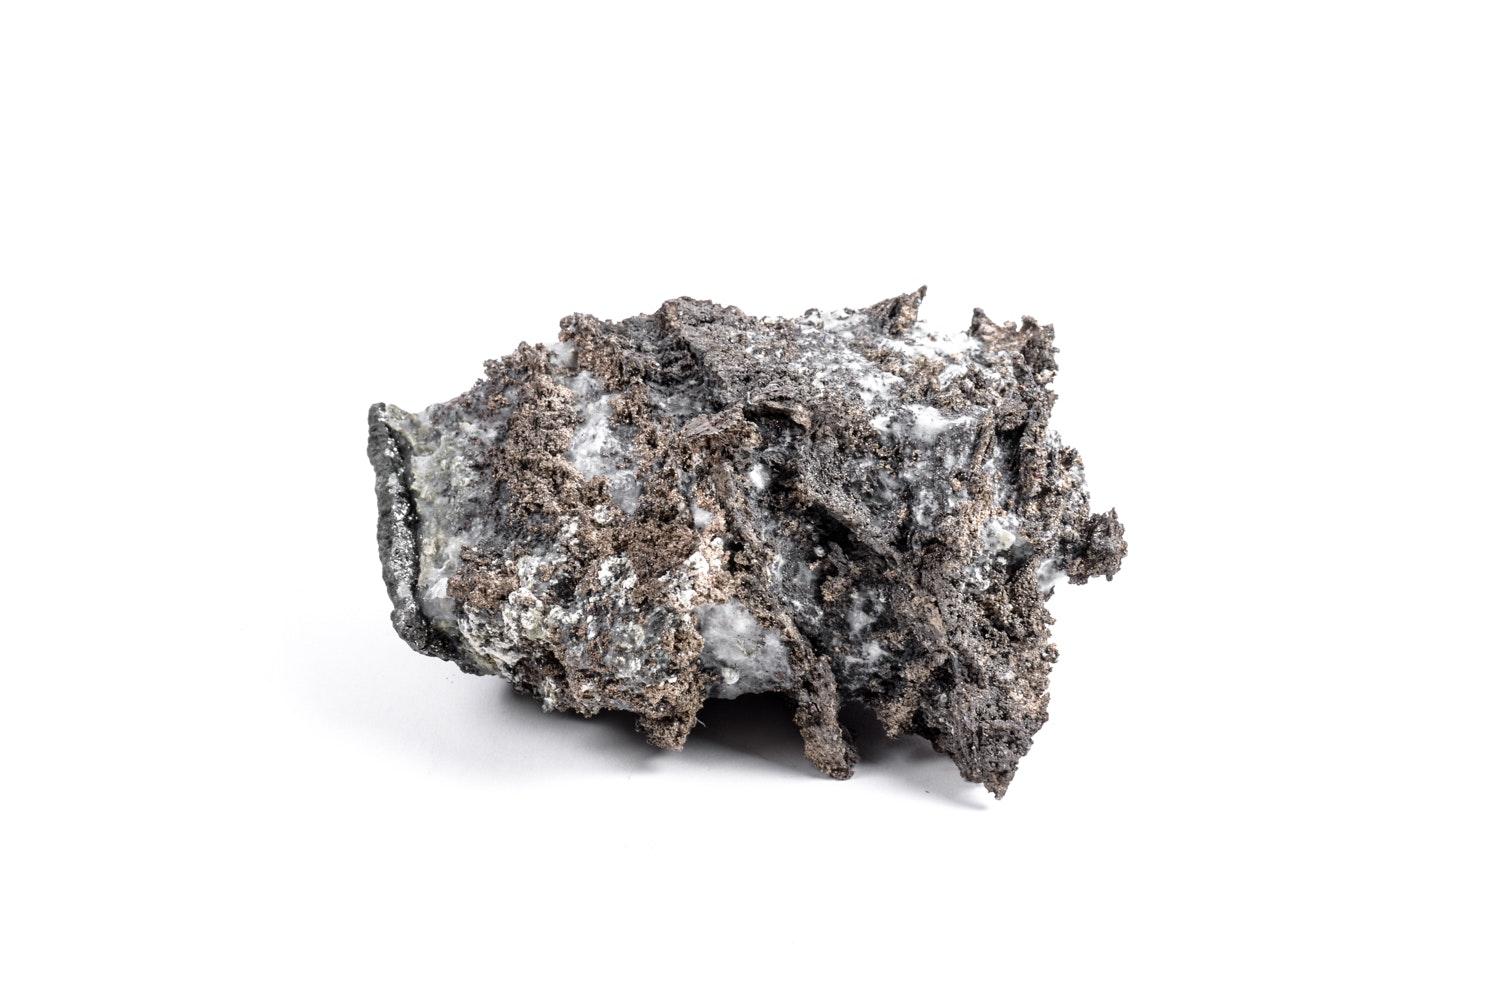 Native Silver in Calcite Specimen